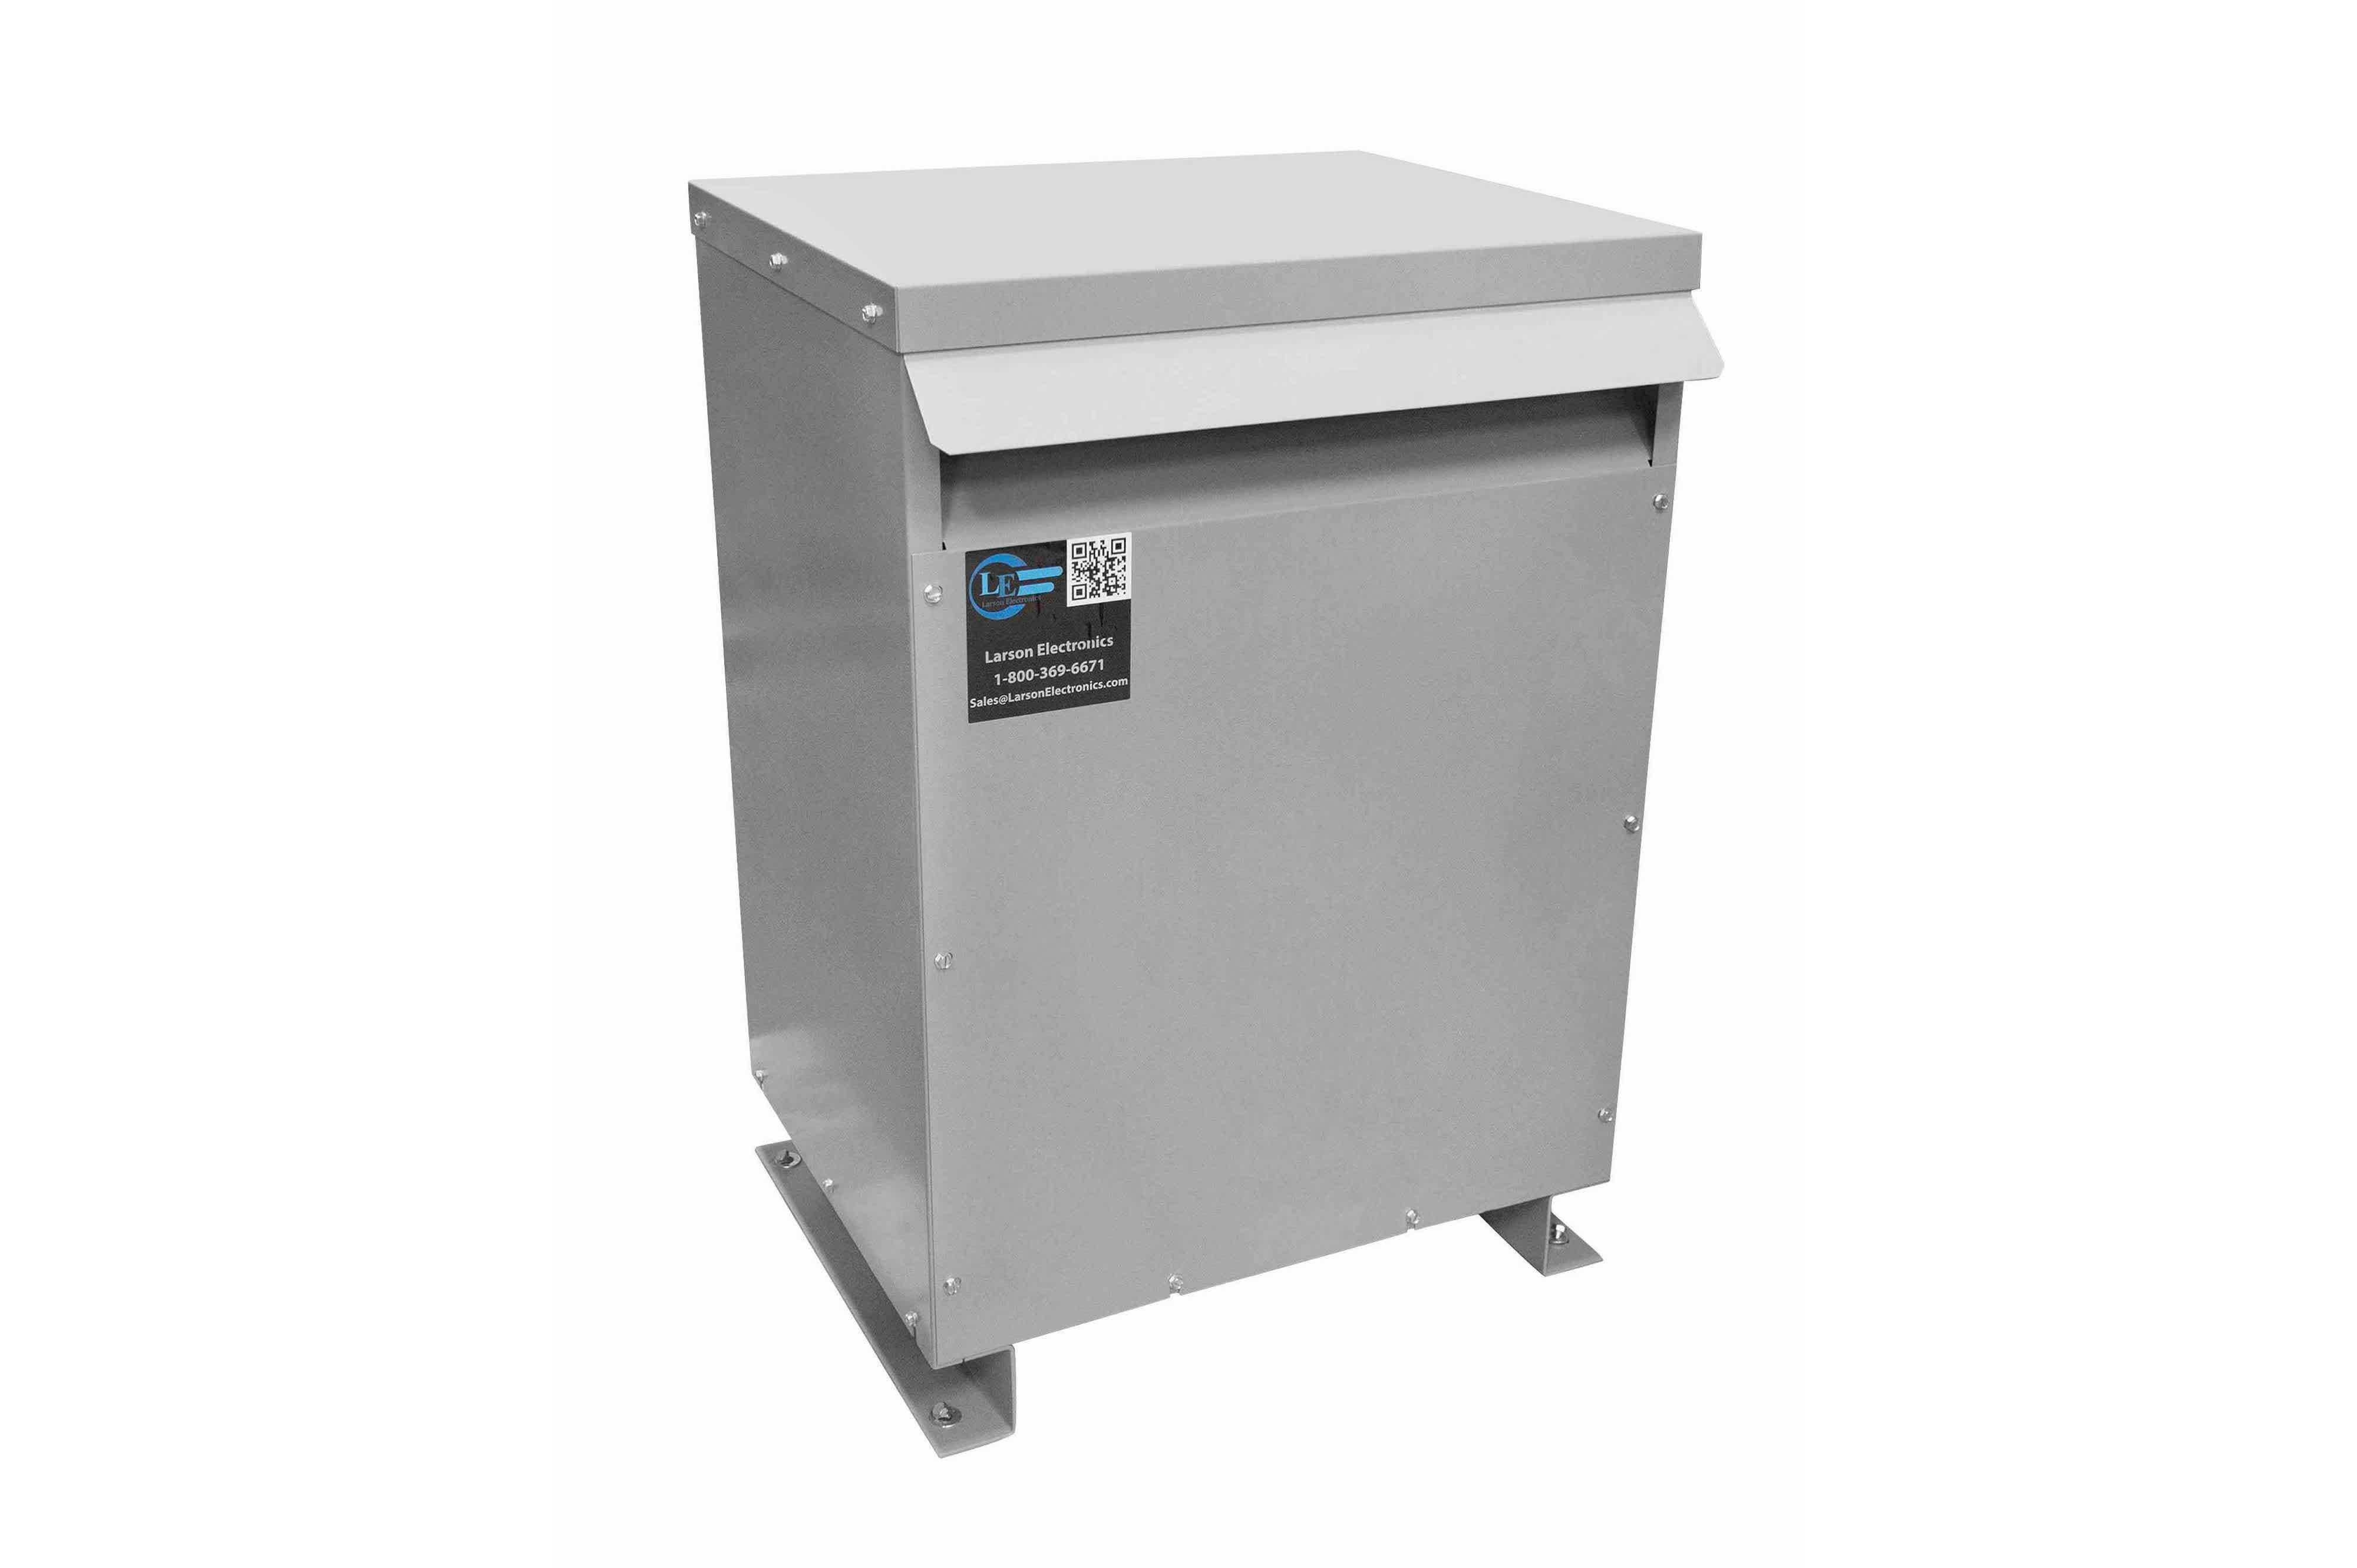 20 kVA 3PH Isolation Transformer, 400V Wye Primary, 600V Delta Secondary, N3R, Ventilated, 60 Hz